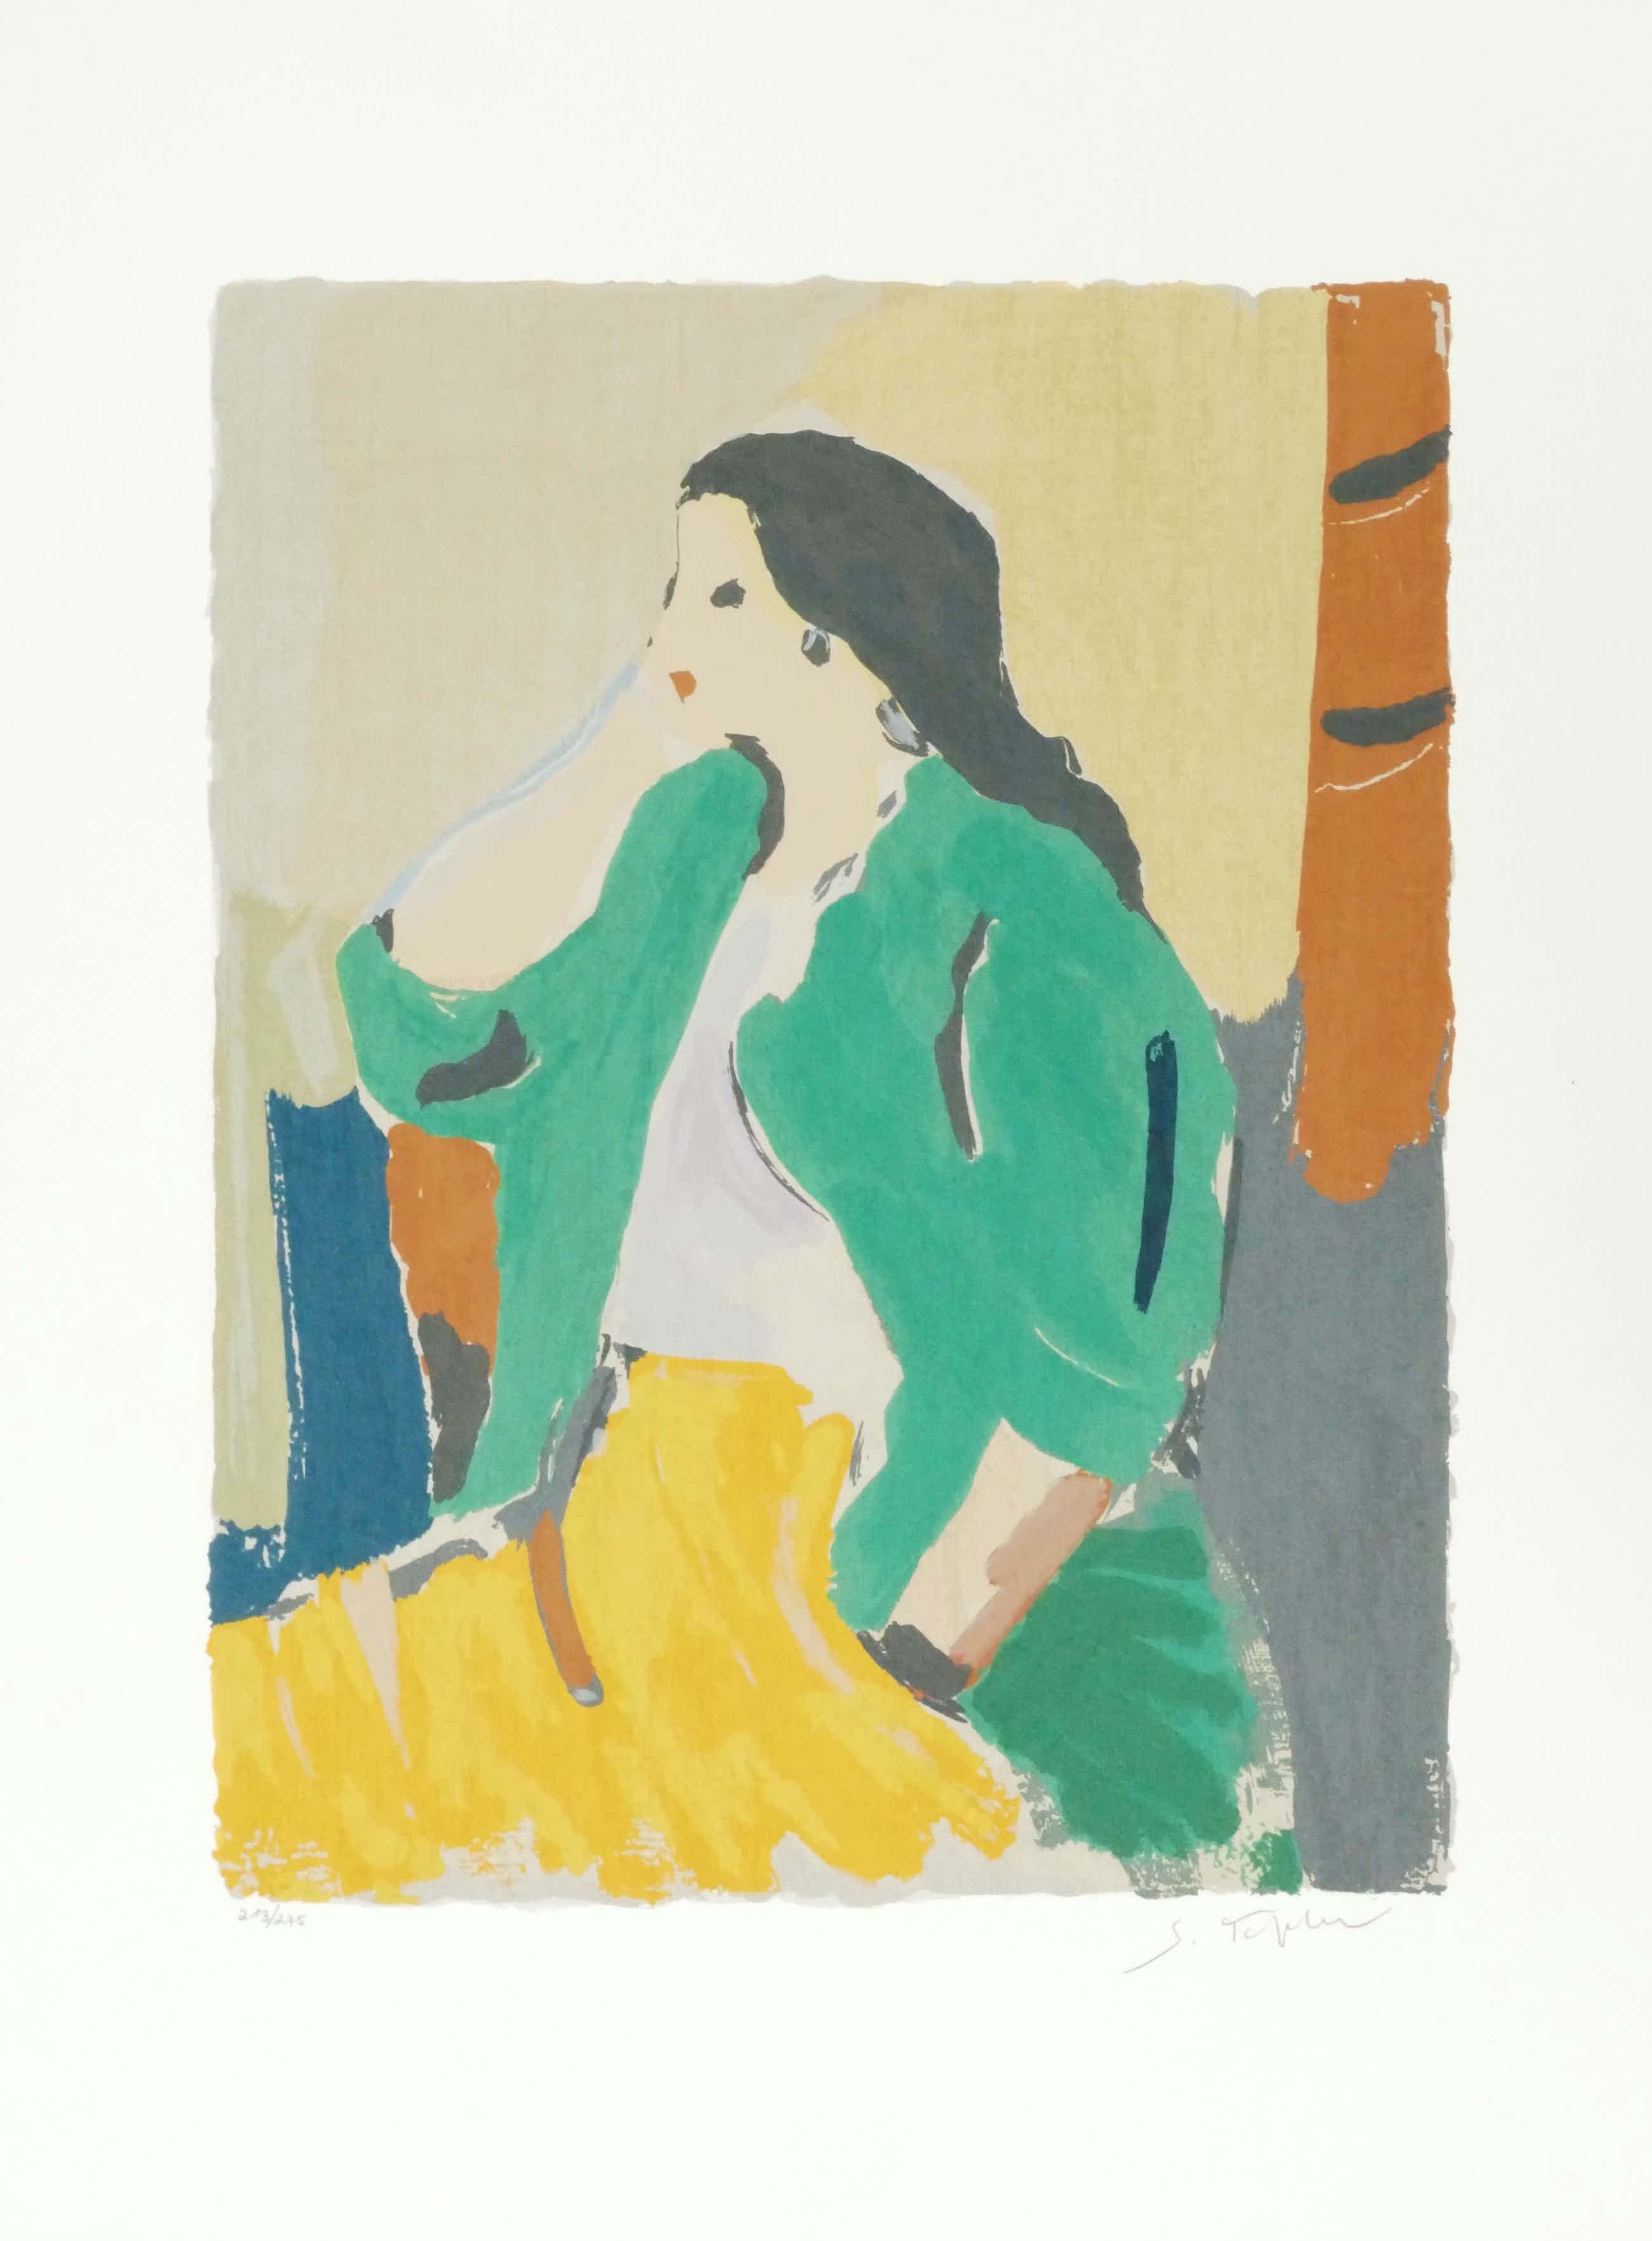 Samuel Tepler - Woman in a yellow skirt kopen? Bied vanaf 250!